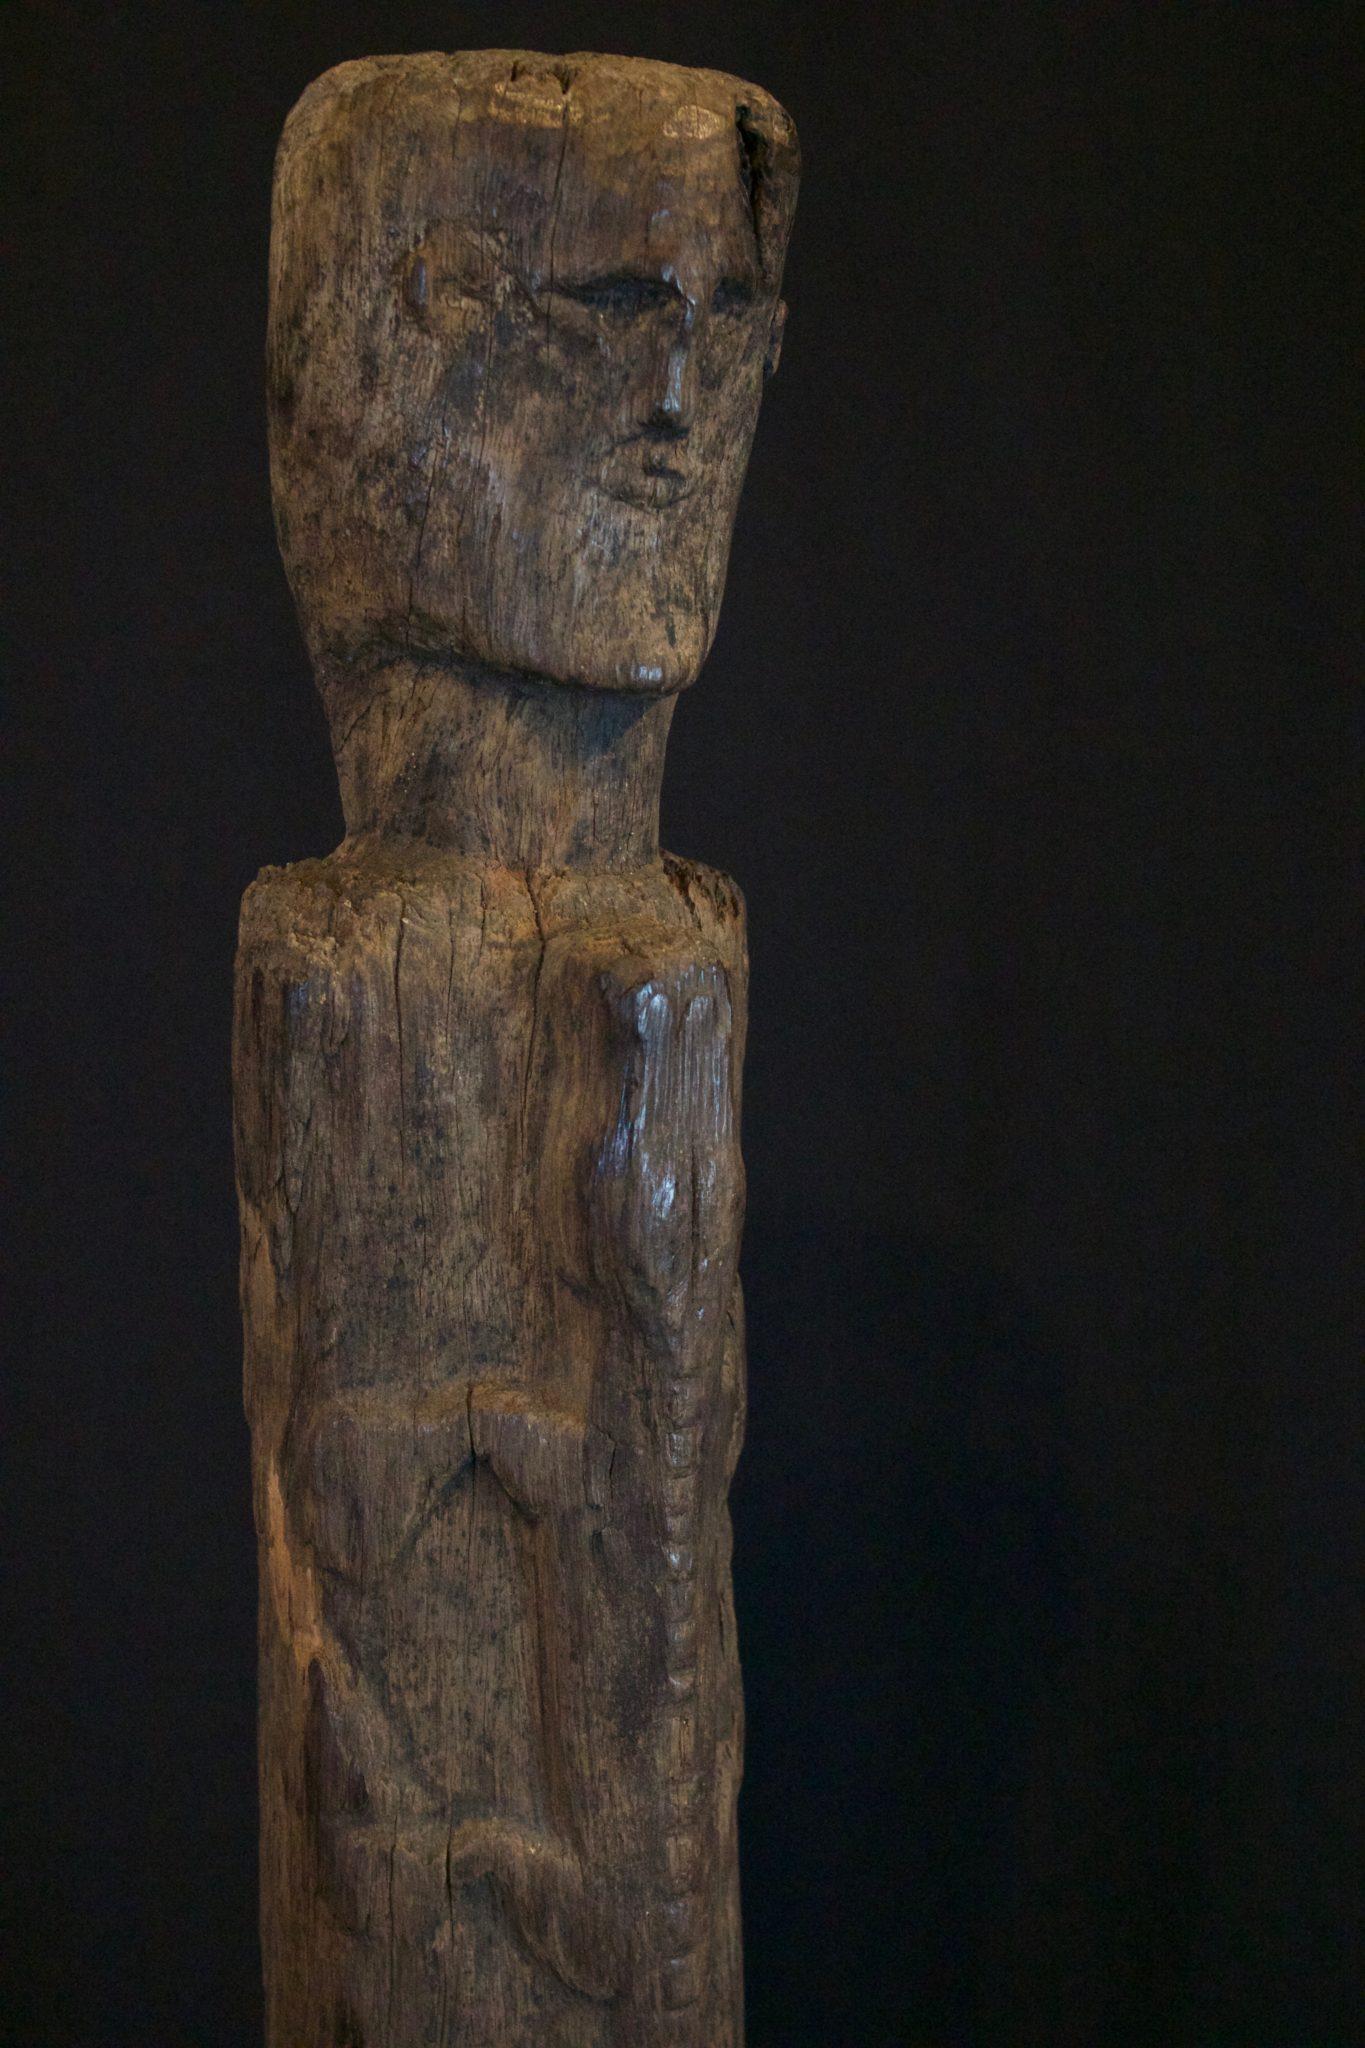 "Shaman Figure with Alligator, West Sumba Island, Lesser Sunda Islands, Indonesia, Kodi tribe, Mid to late 19th c, Wood, Used for protection rituals. 19 ¾"" x 4 ¼"" x 4"", $750."